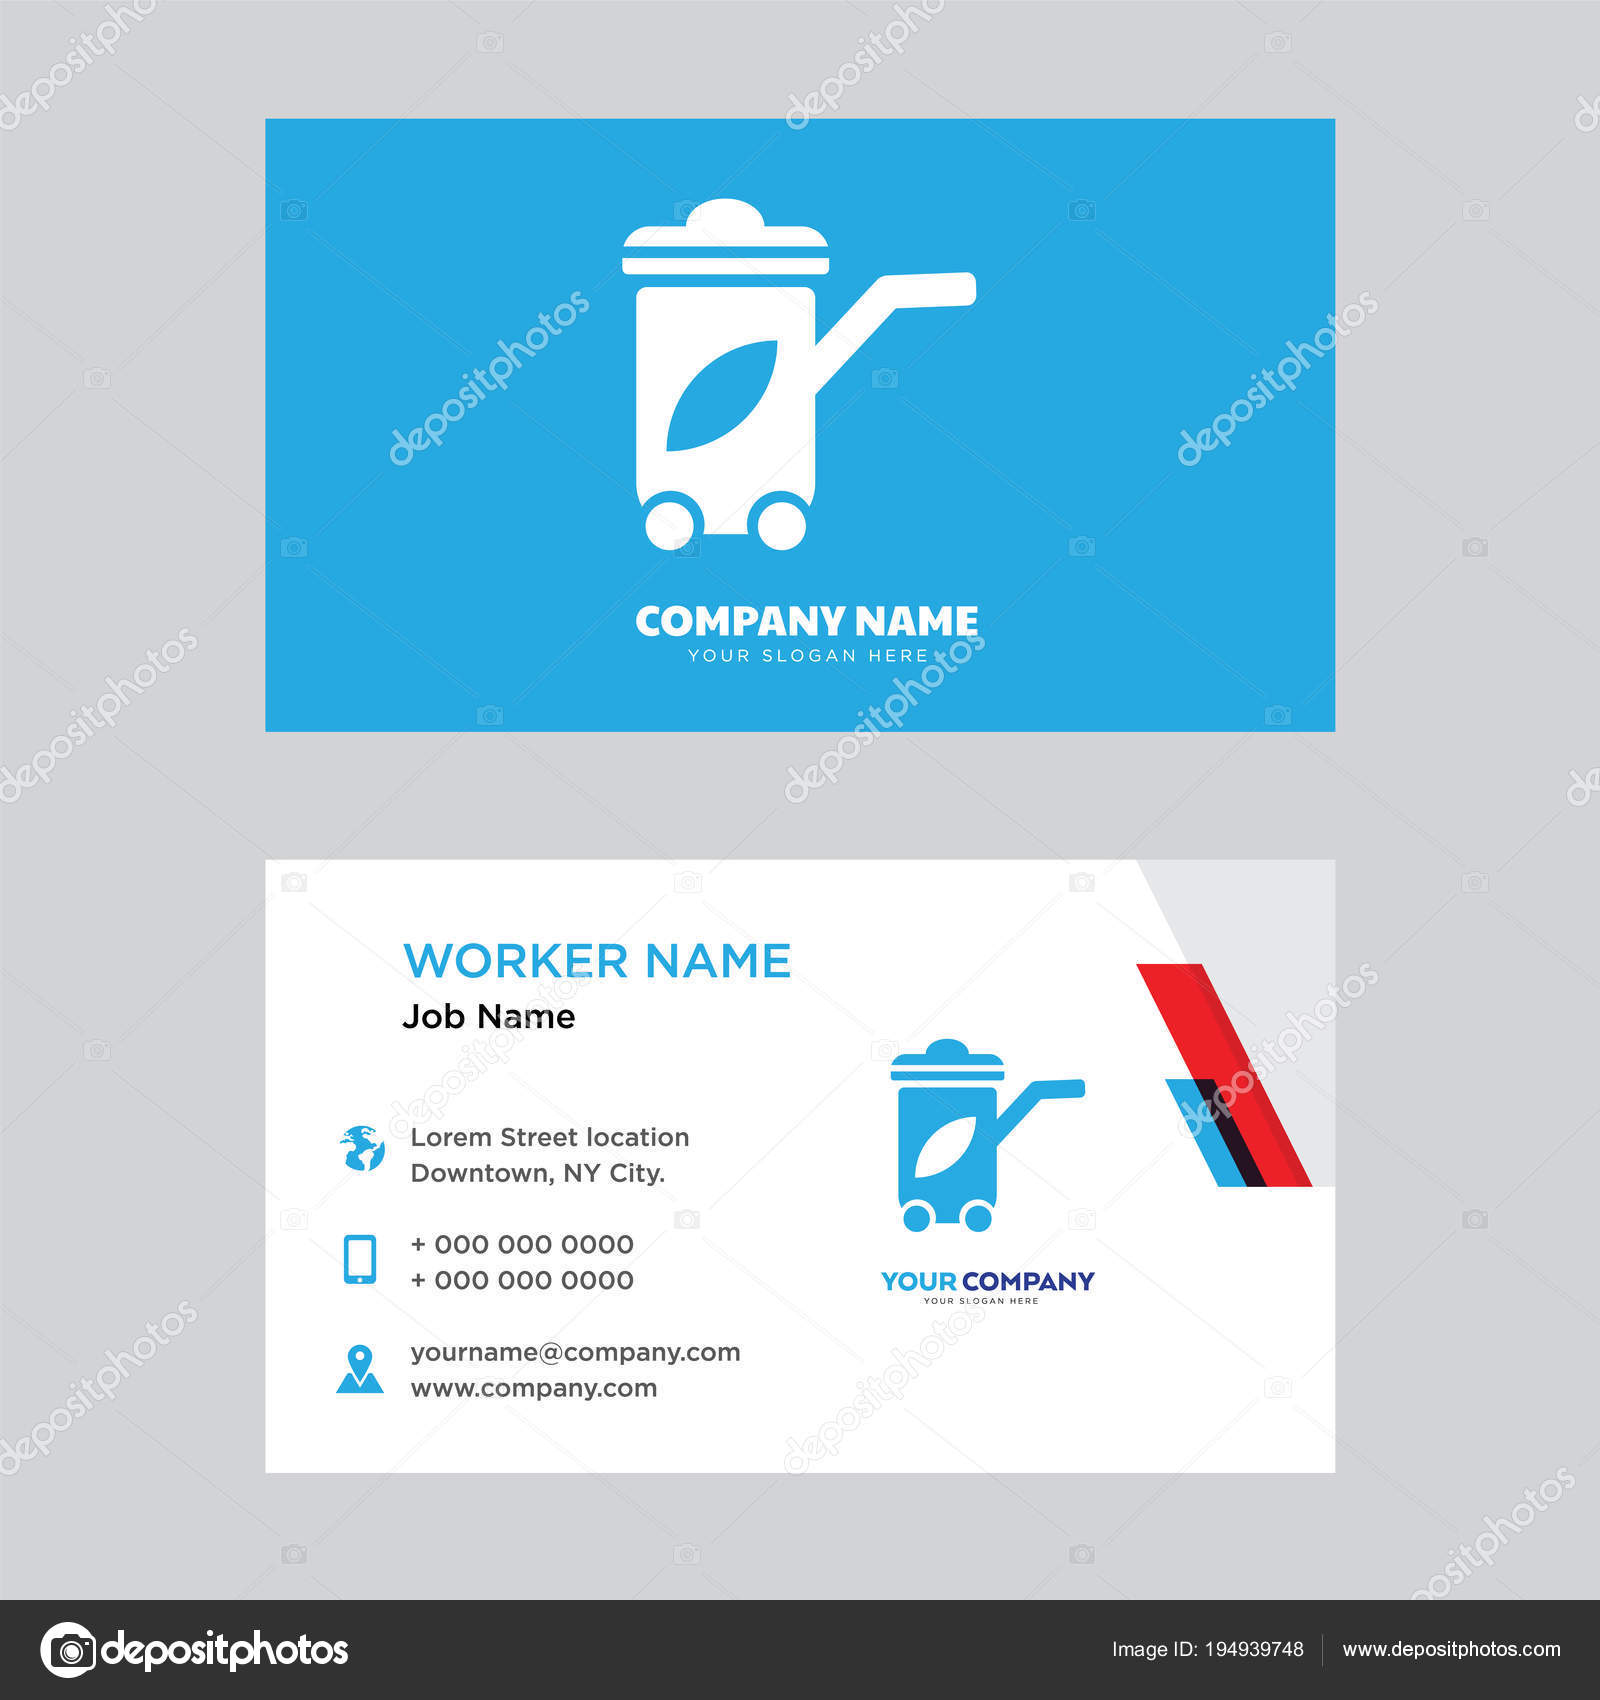 Recycling Bin Business Card Design Stock Vector